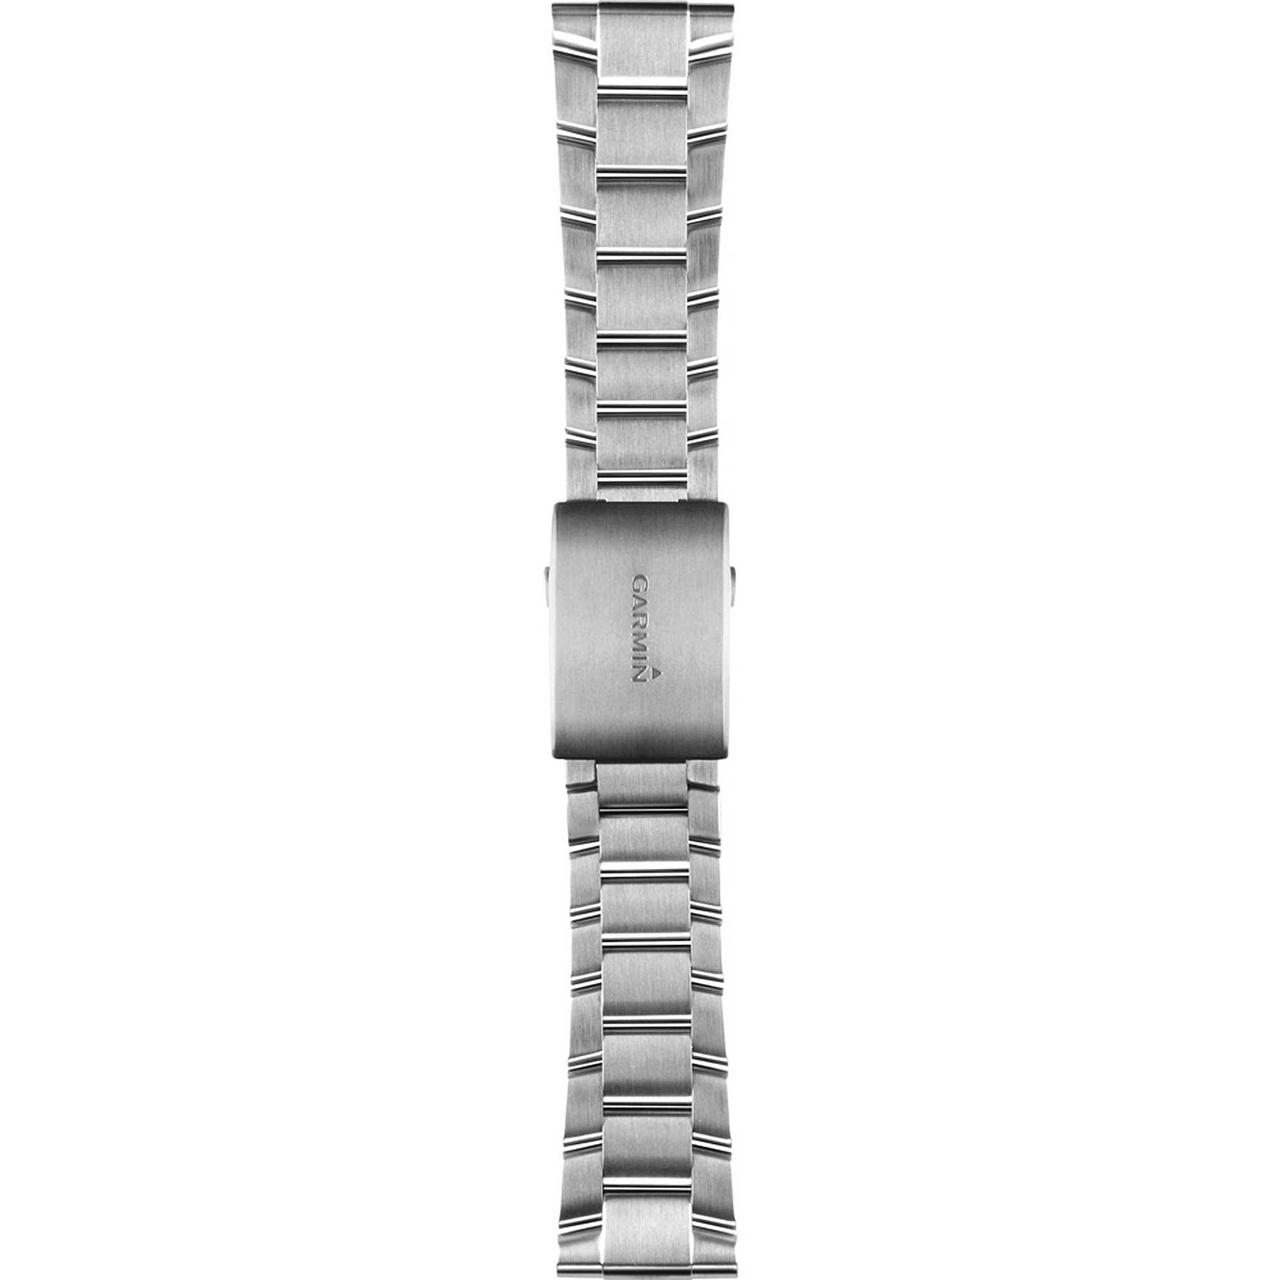 Ремешок на запястье для Garmin fenix 3 Titanium Watch Band Silver (010-12168-20)